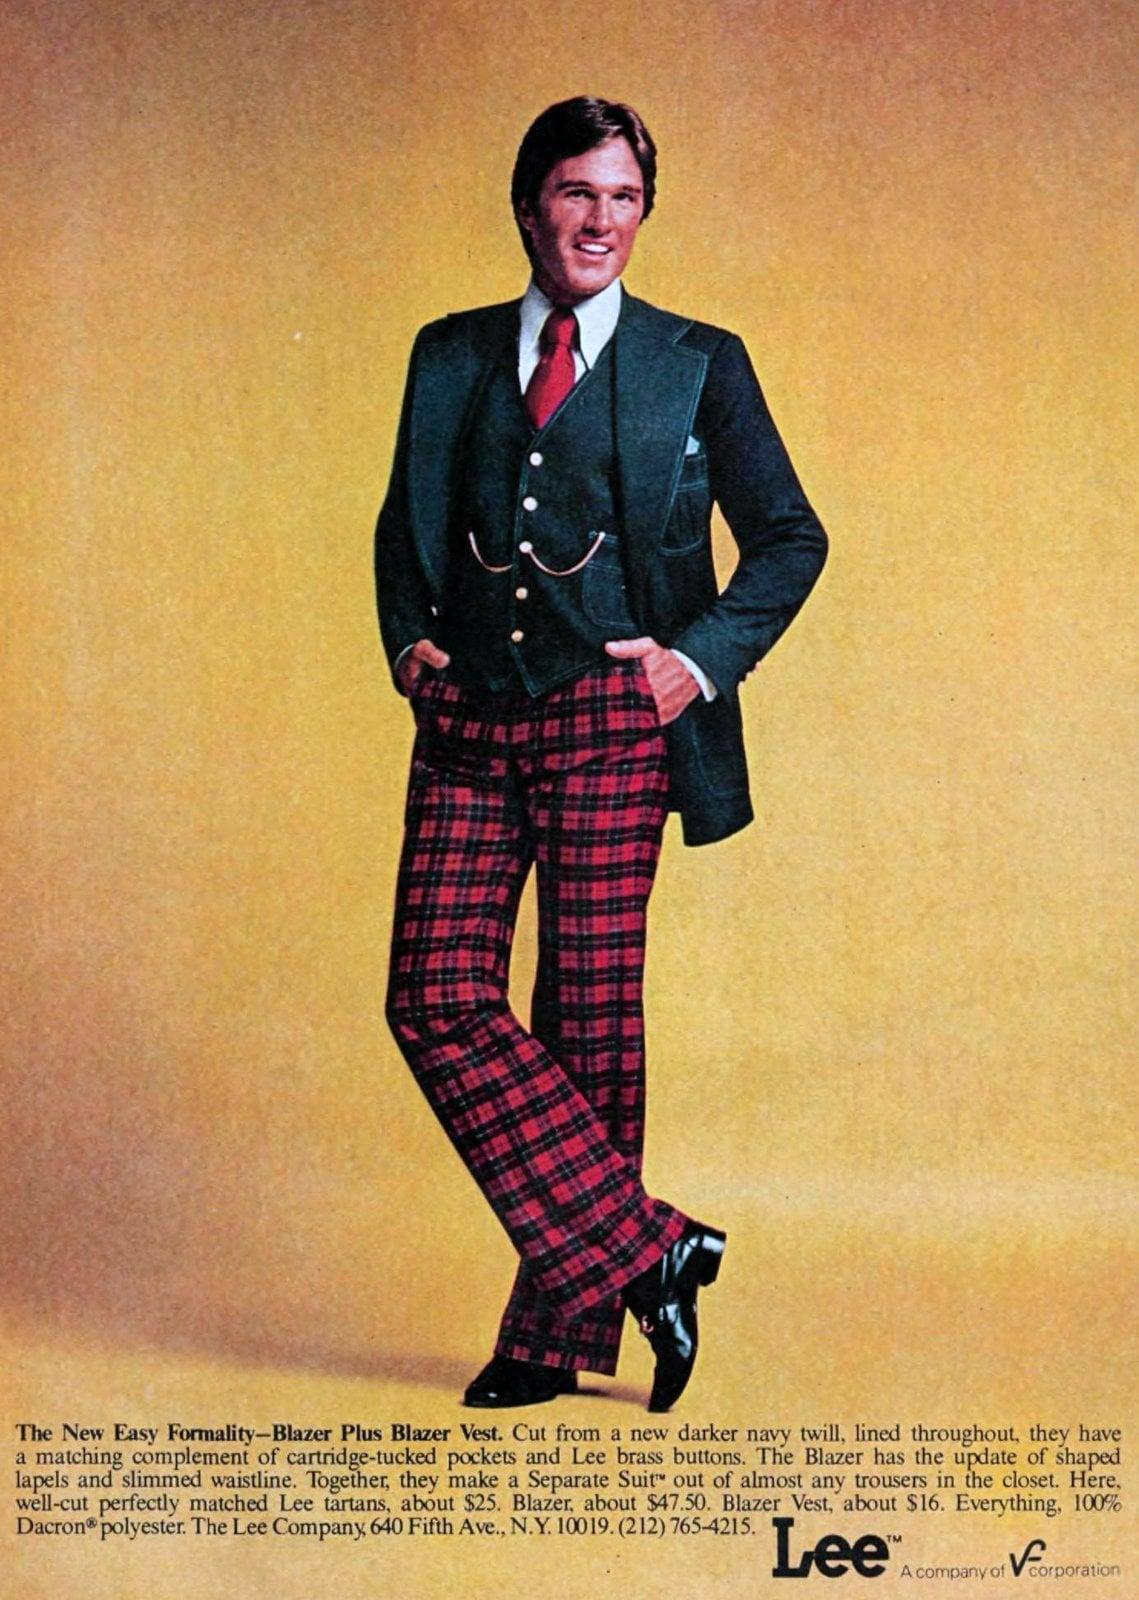 Lee blazer and plazer vest plus checked pants (1976)